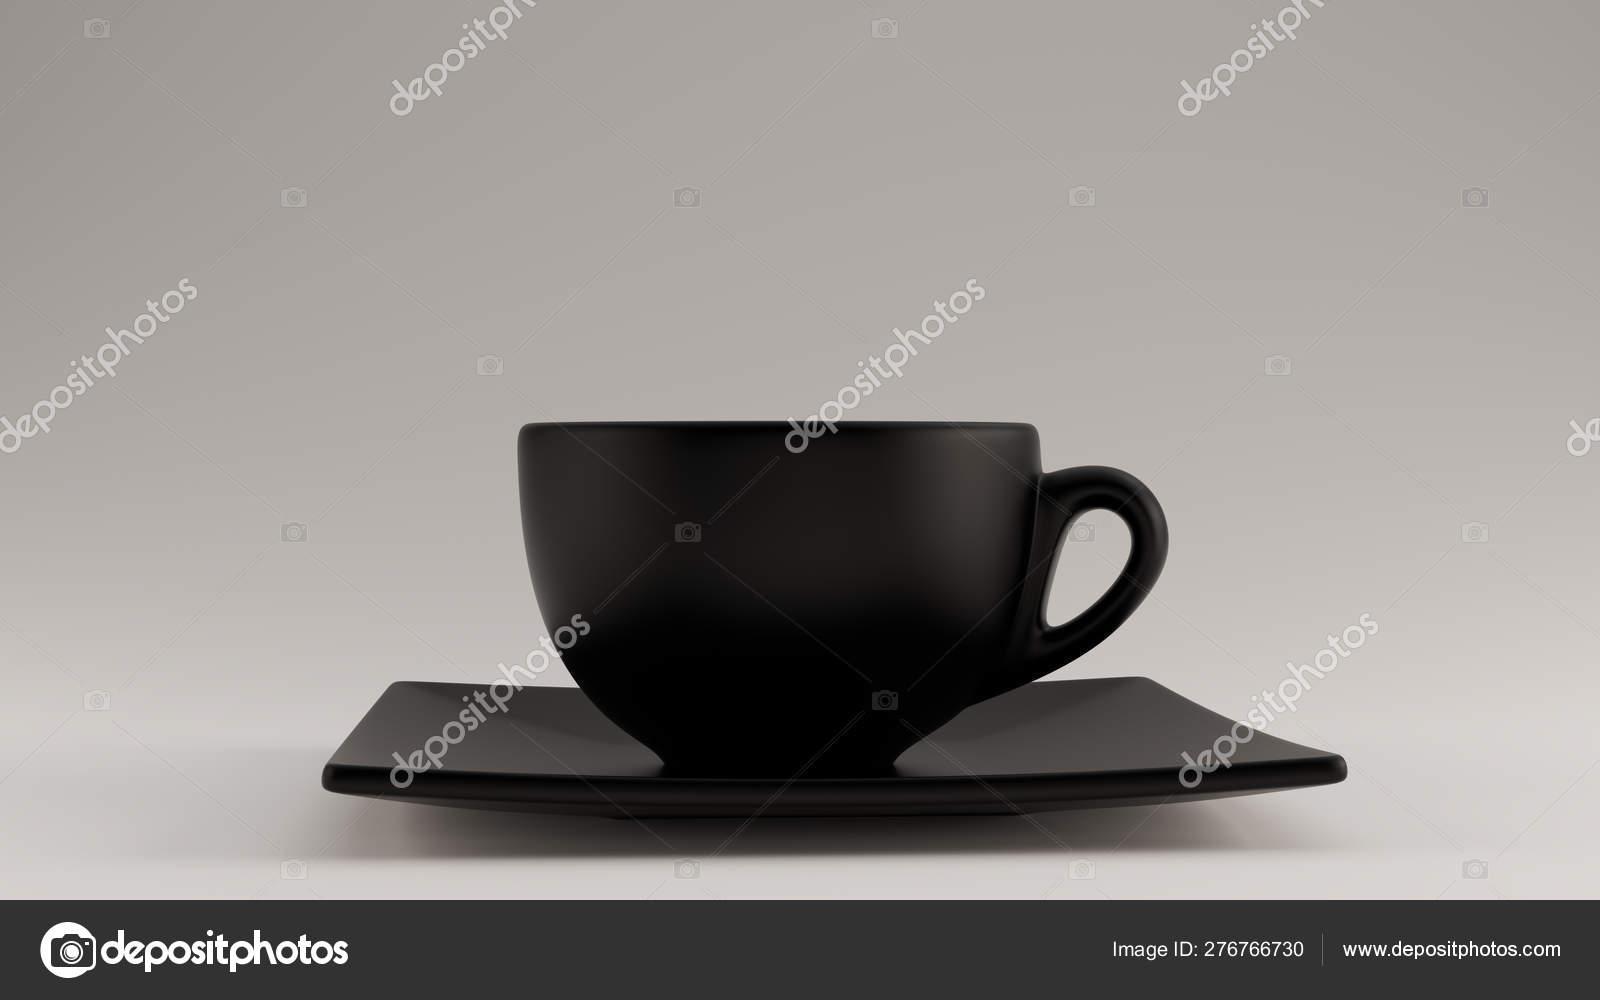 Black Coffee Cup Saucer Cappuccino Tea Illustration Render Stock Photo C 80schild 276766730